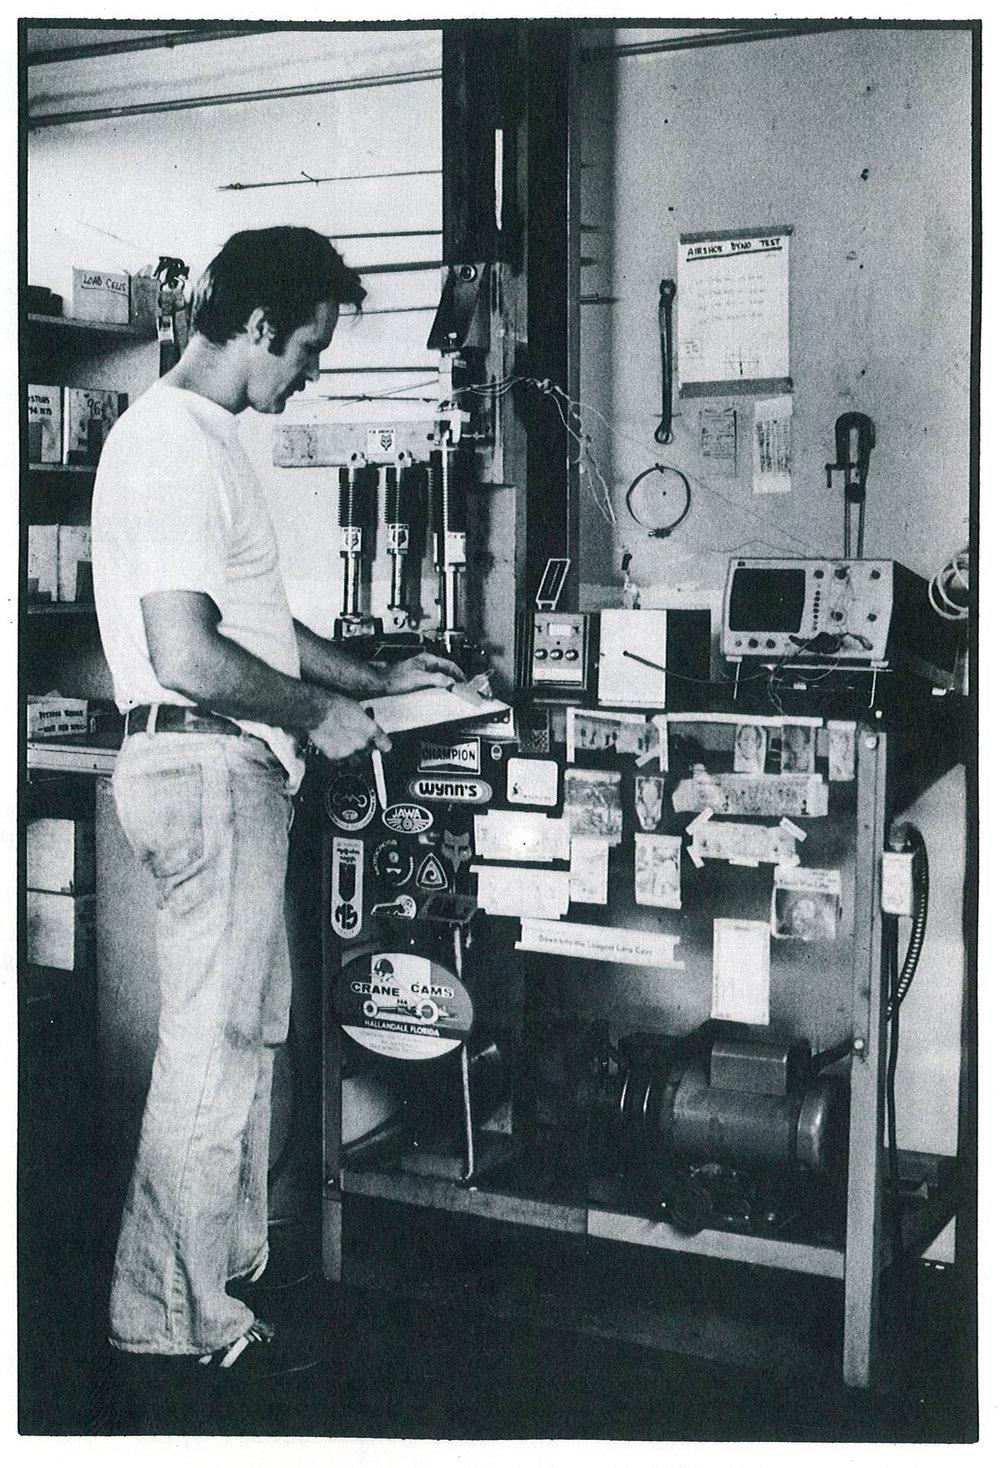 Robert Fox 1977 Fox Shox Dyno Test.jpg